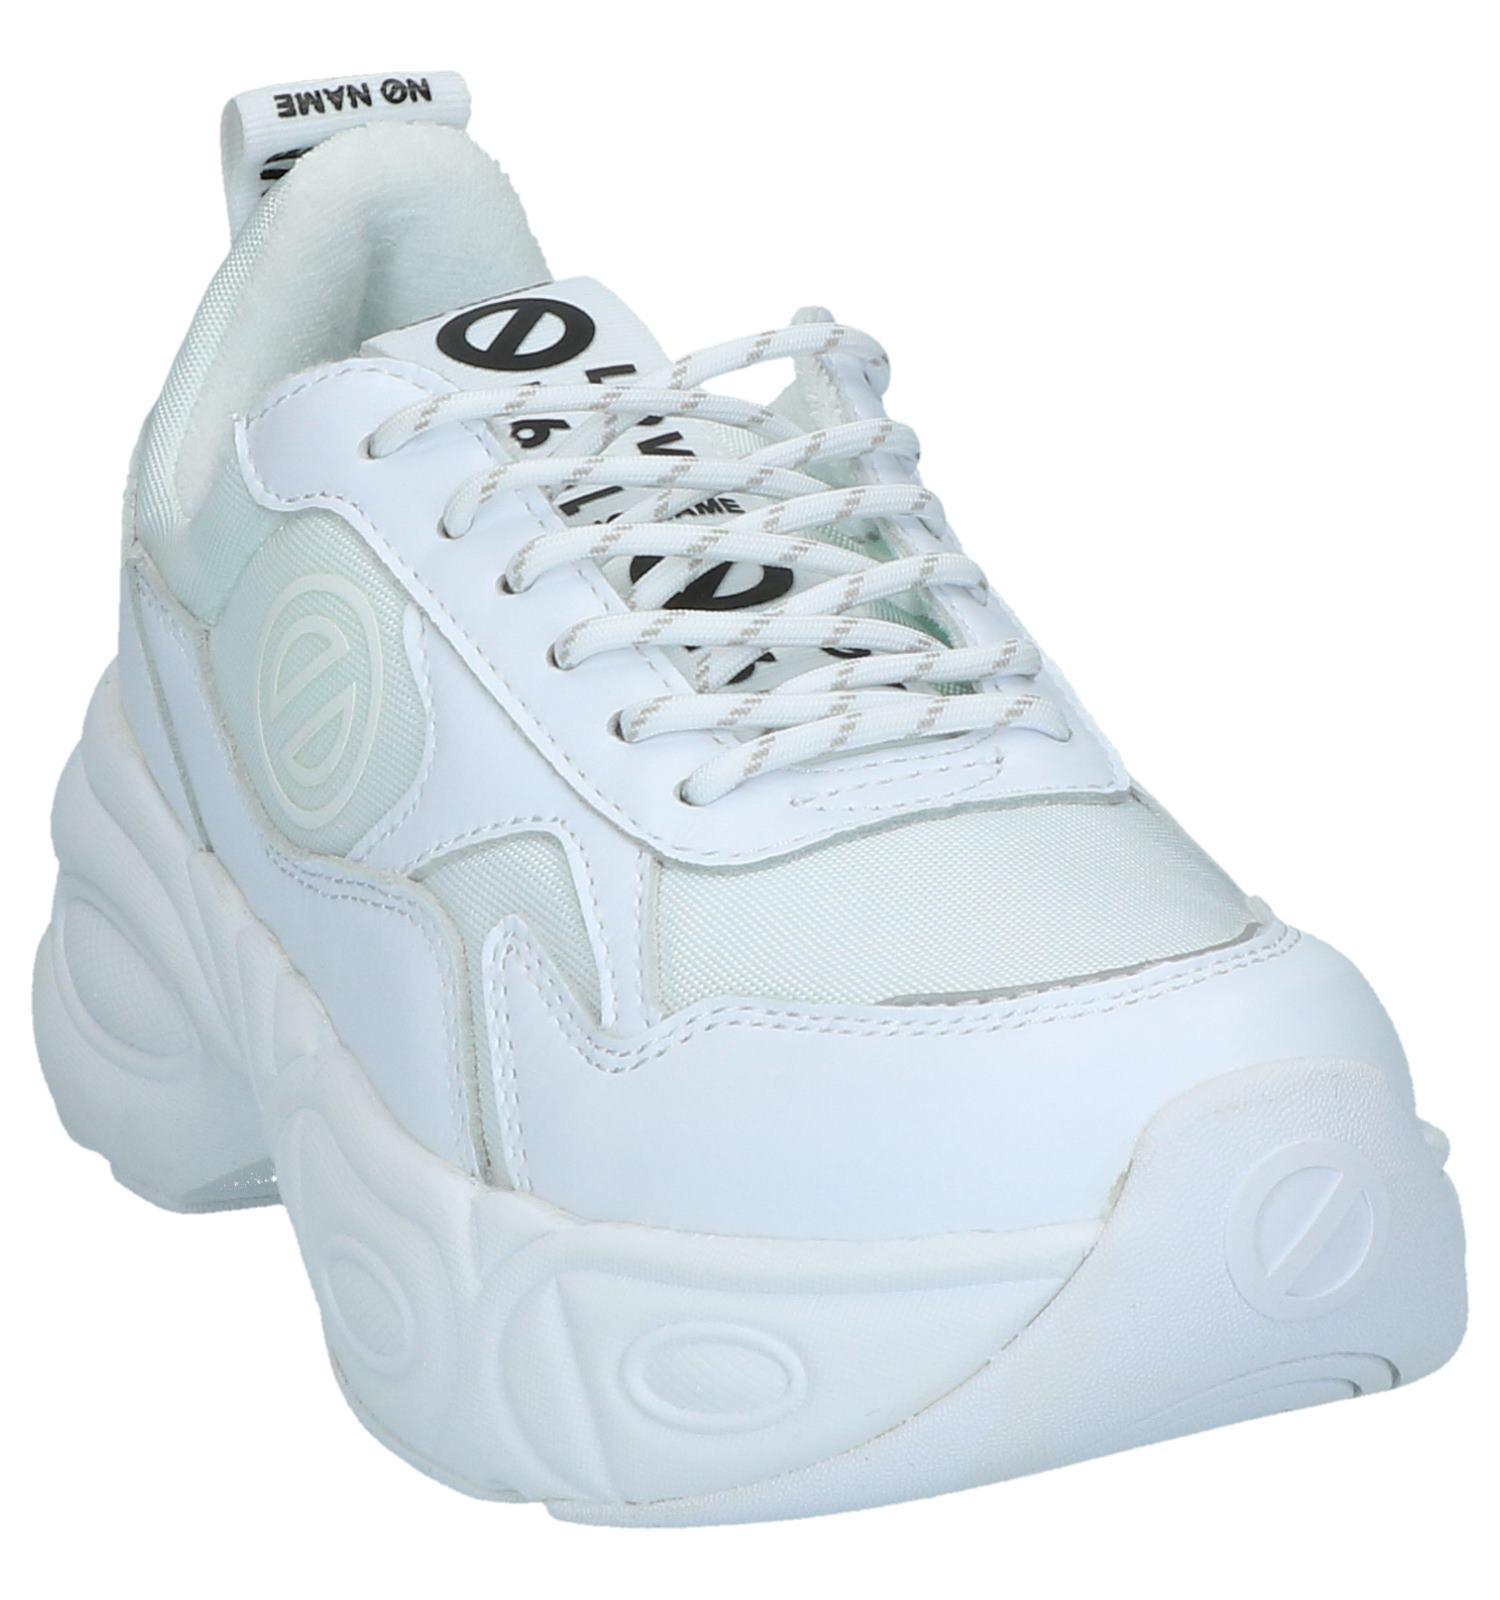 Name No Sneakers Nitro Witte Jogger 8wnvmN0